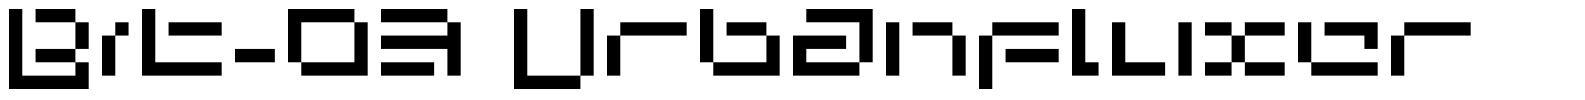 Bit-03 Urbanfluxer